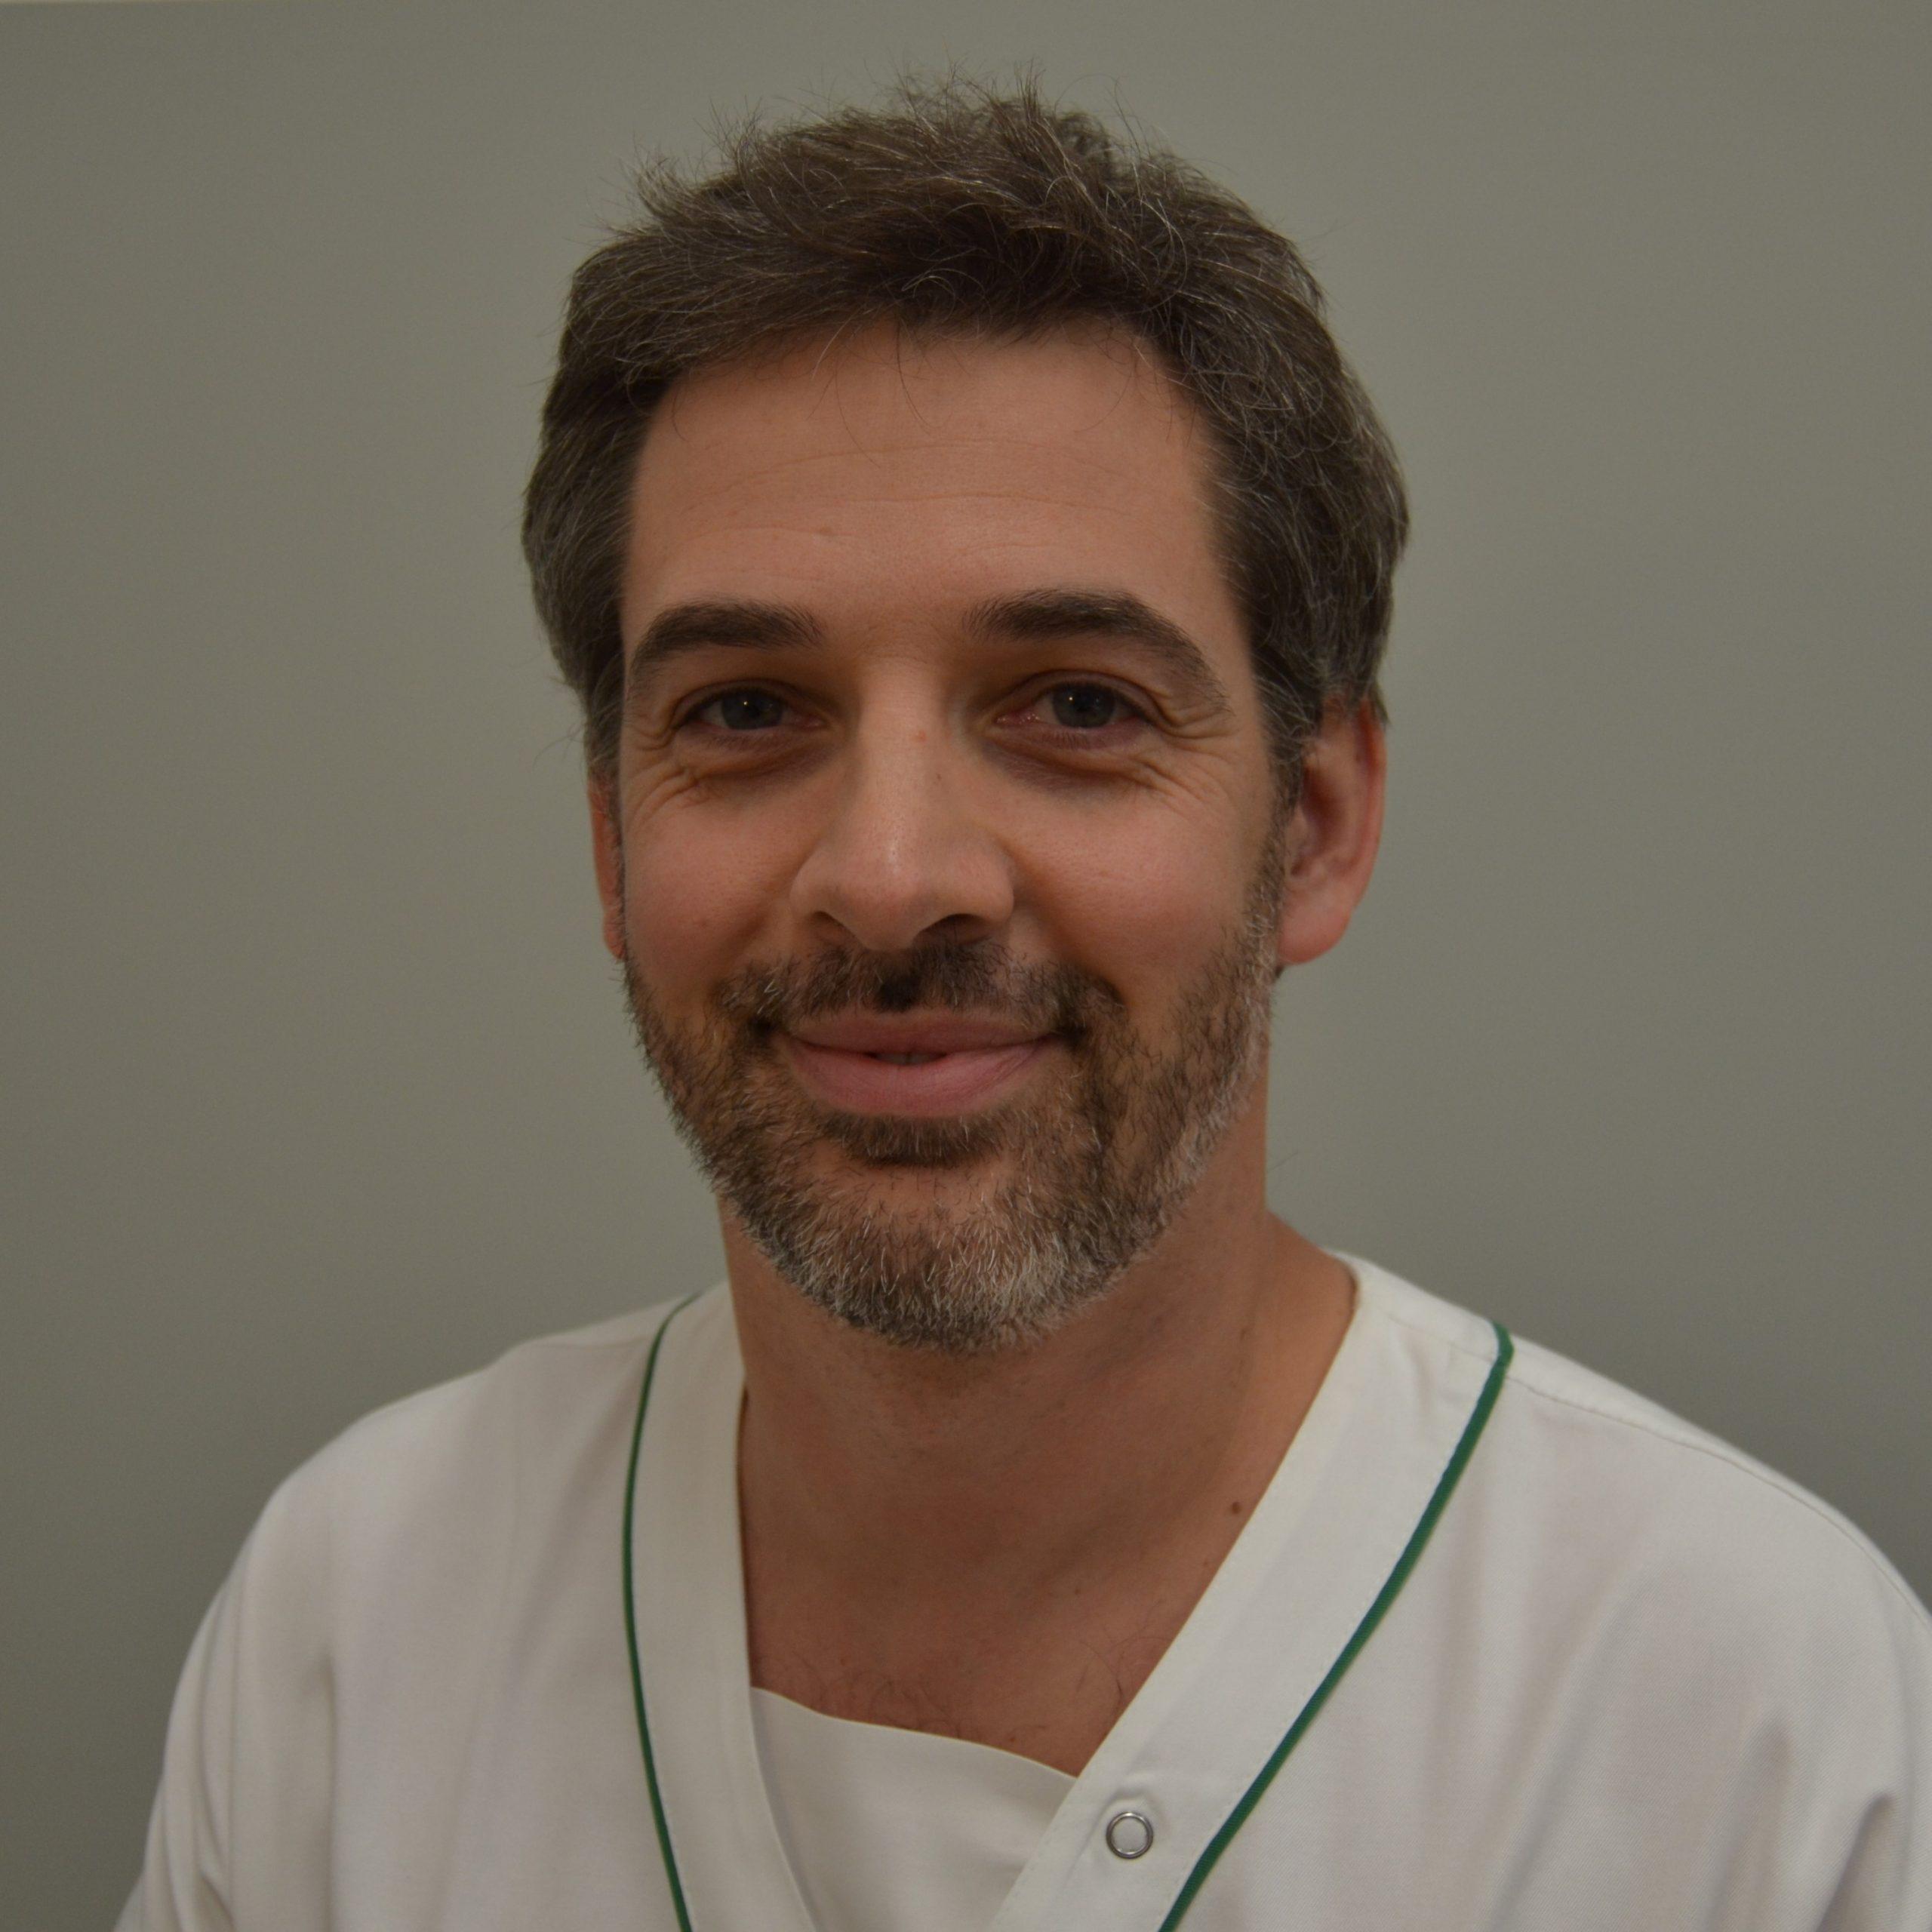 Andrea Turolla